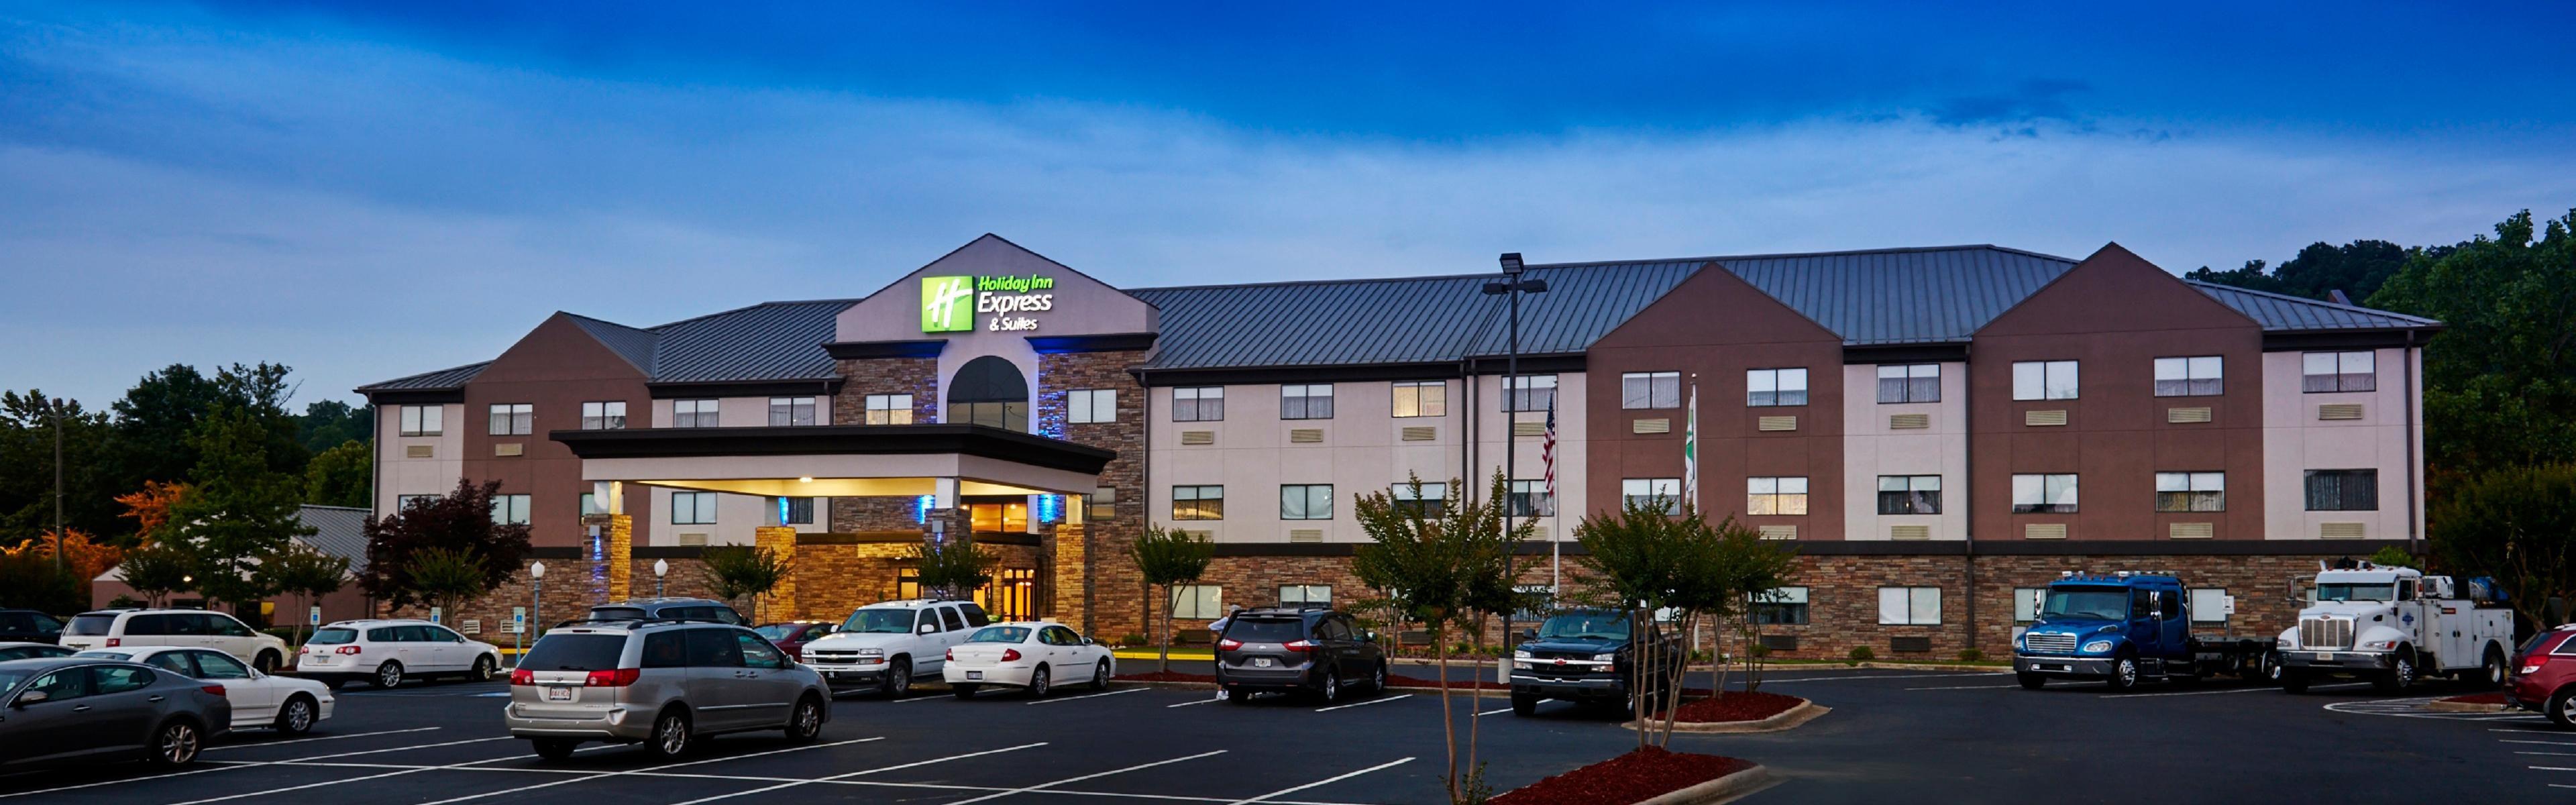 Holiday Inn Express & Suites Birmingham South - Pelham image 0